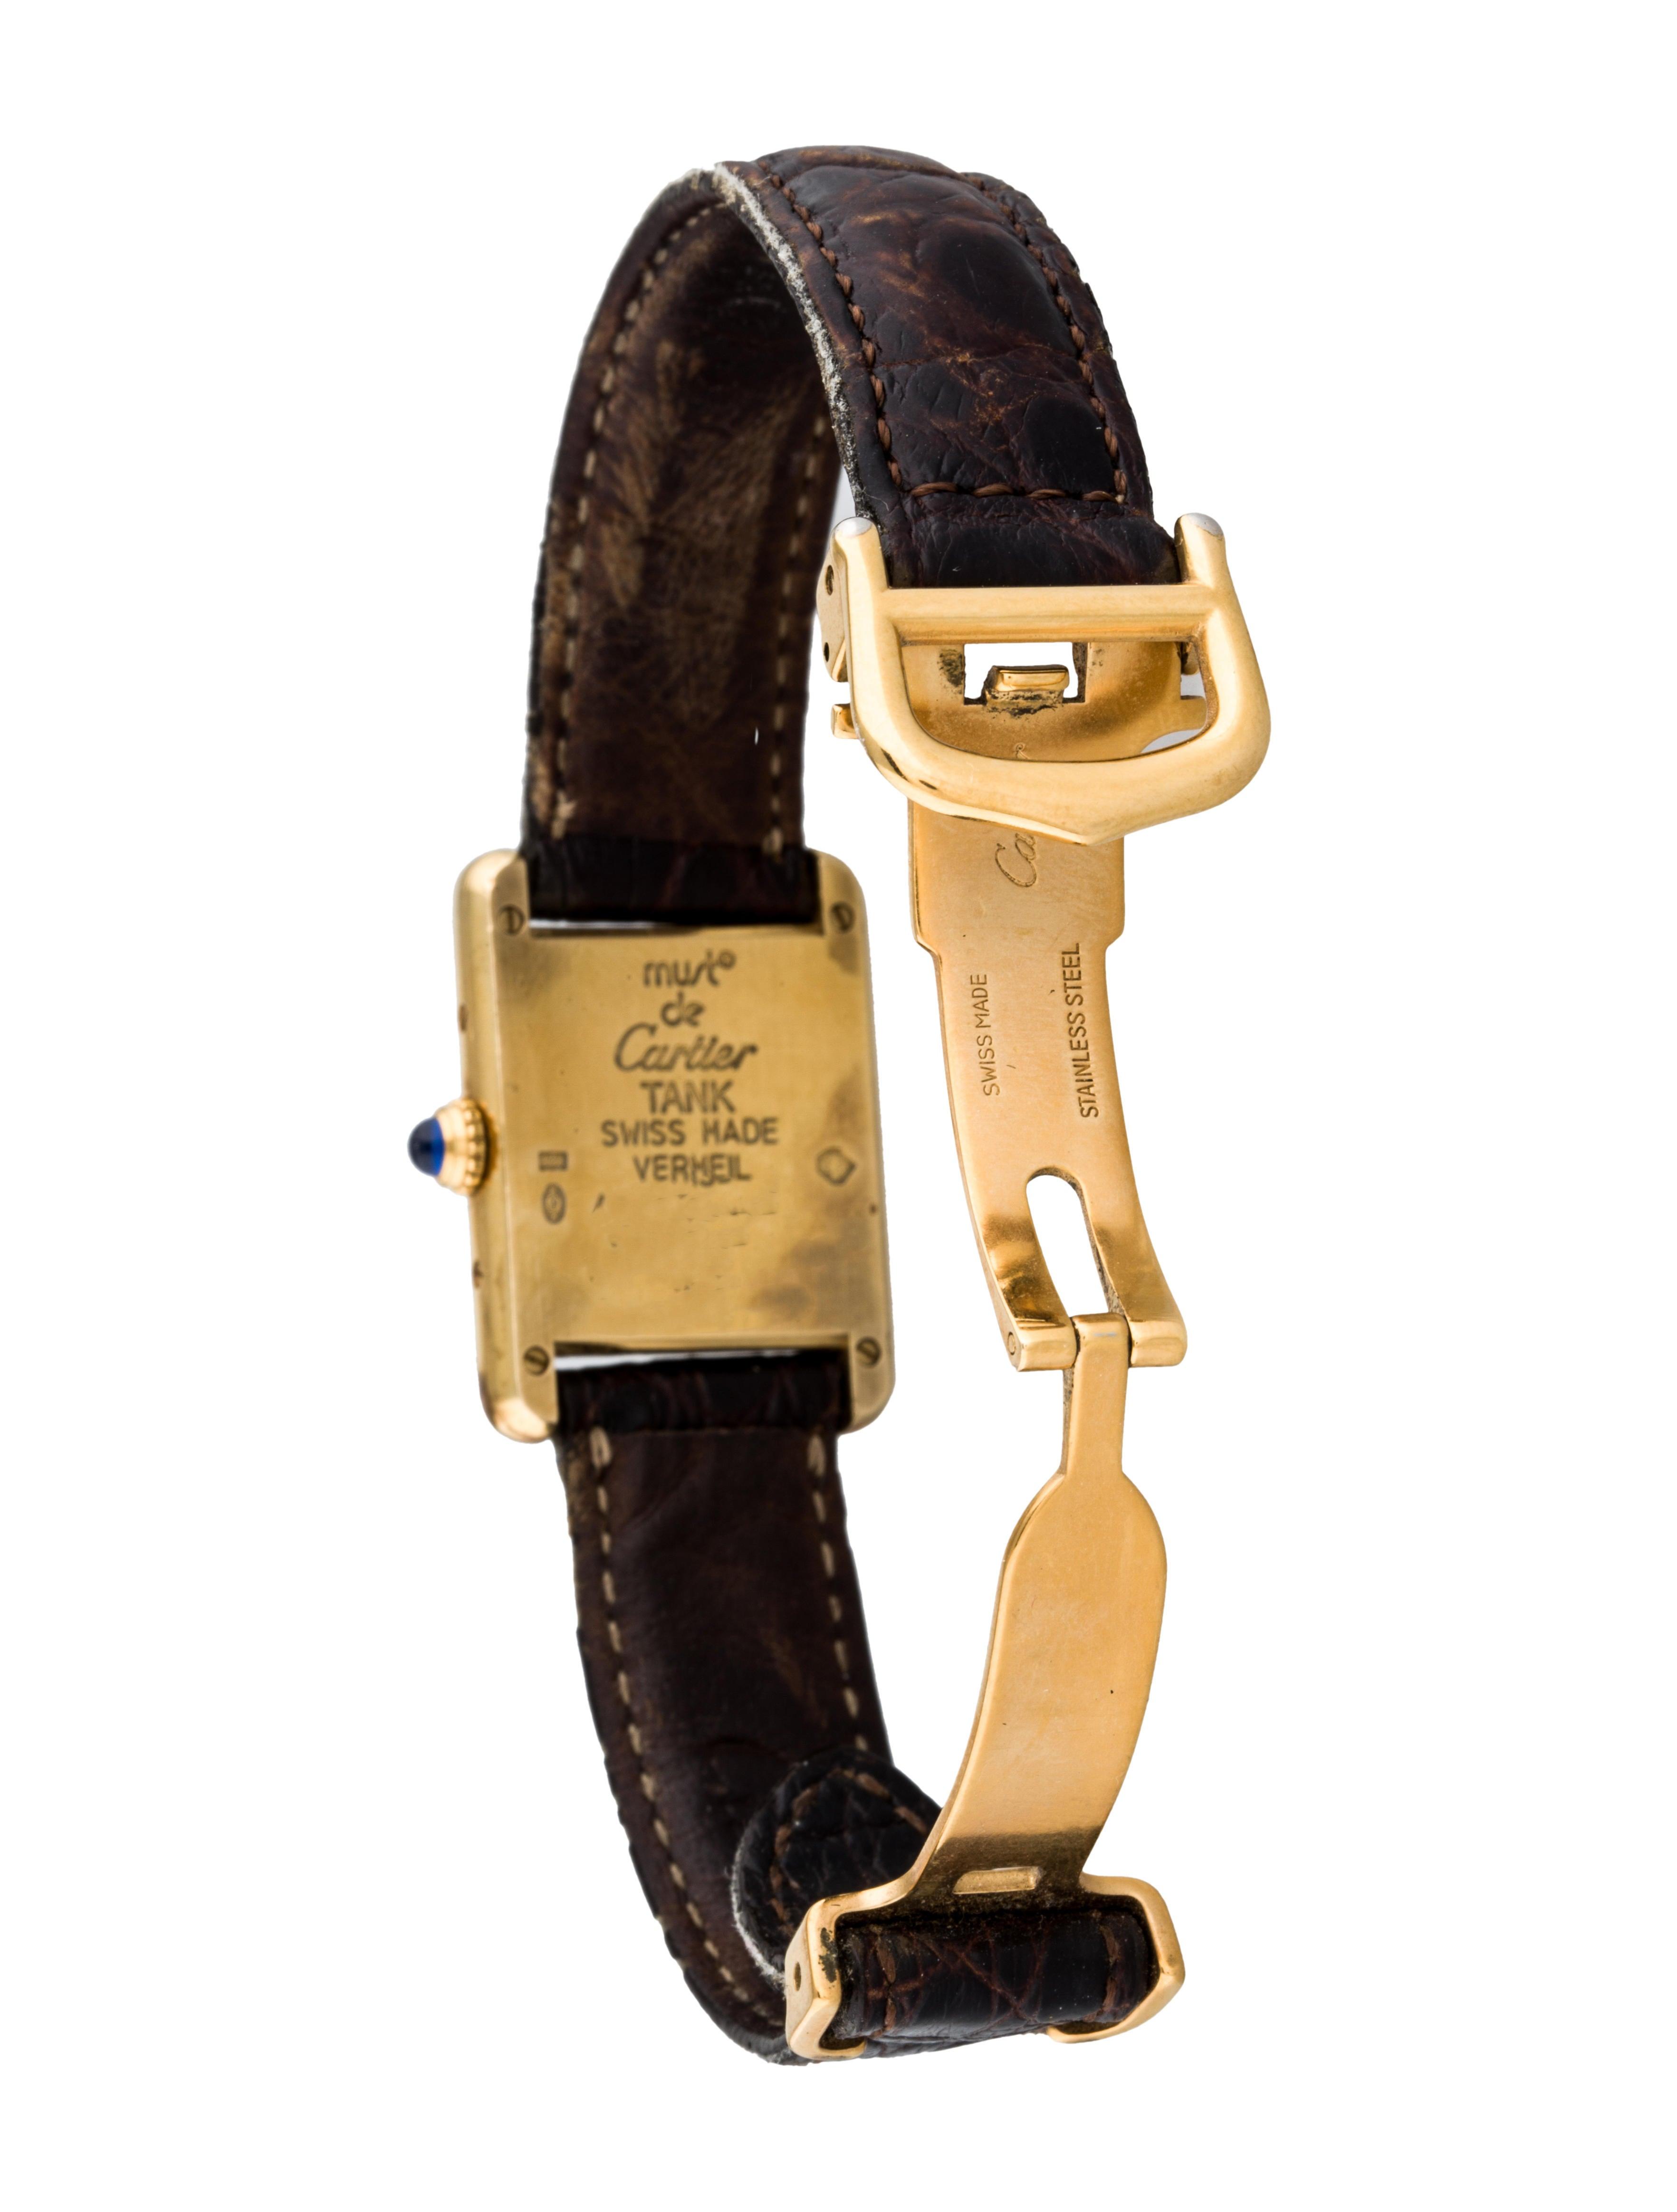 Cartier Must de Cartier Tank Vermeil Watch 1613 Strap  : CRT247275enlarged from www.therealreal.com size 3529 x 4656 jpeg 510kB